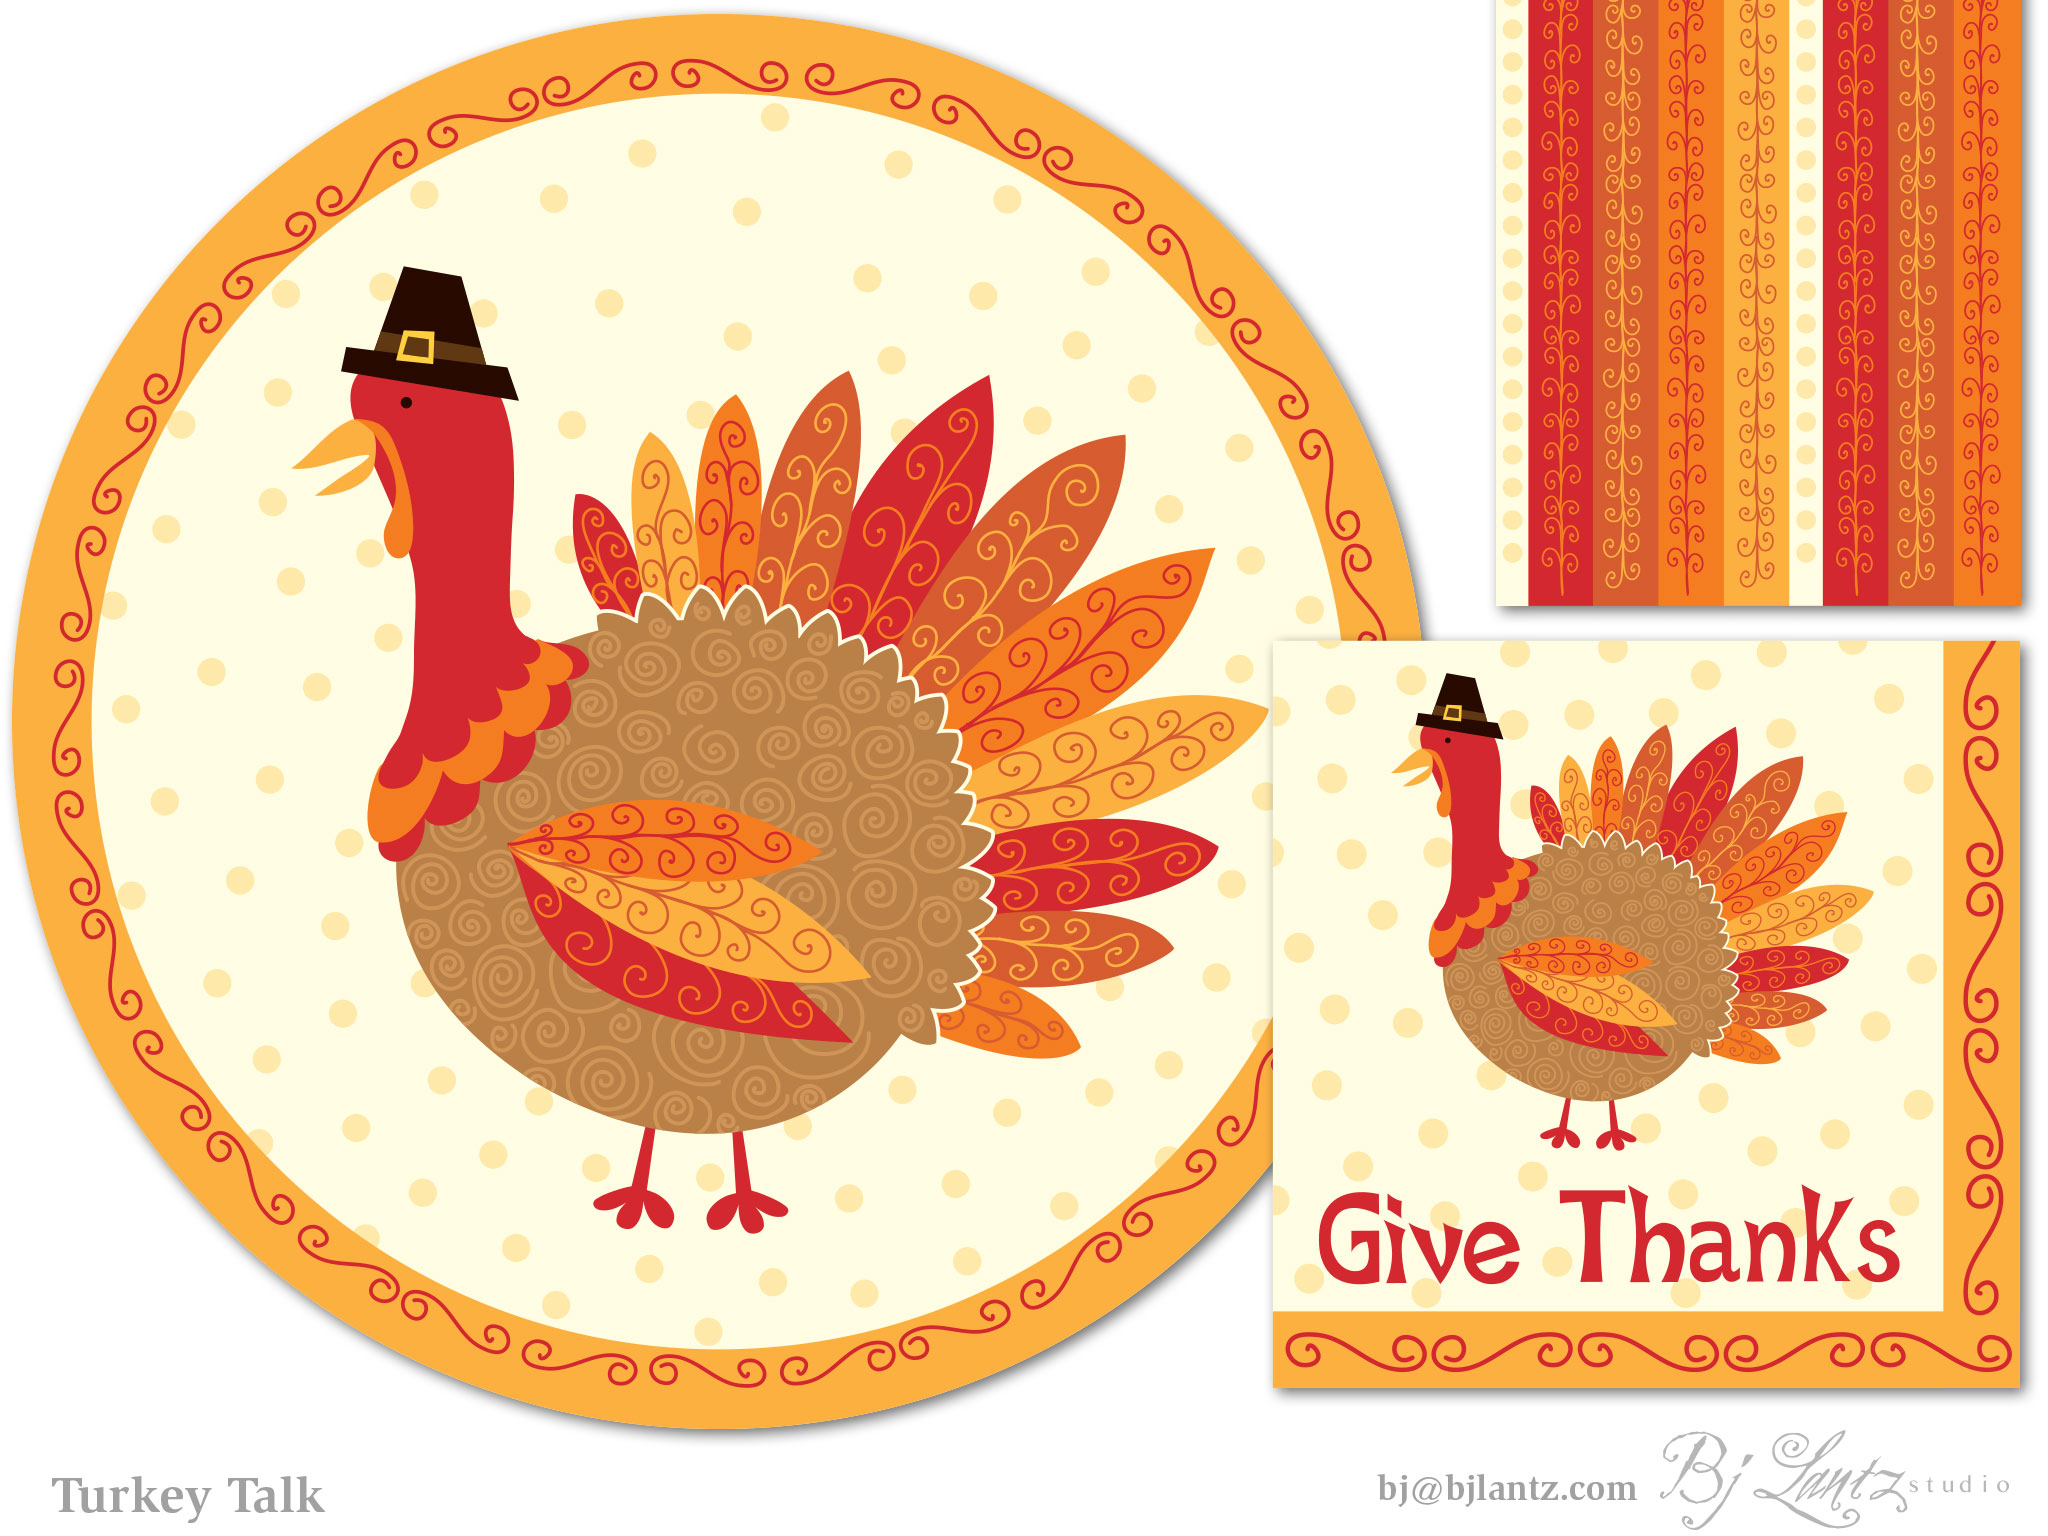 TurkeyTalk-BJ-Lantz_portfolio.jpg